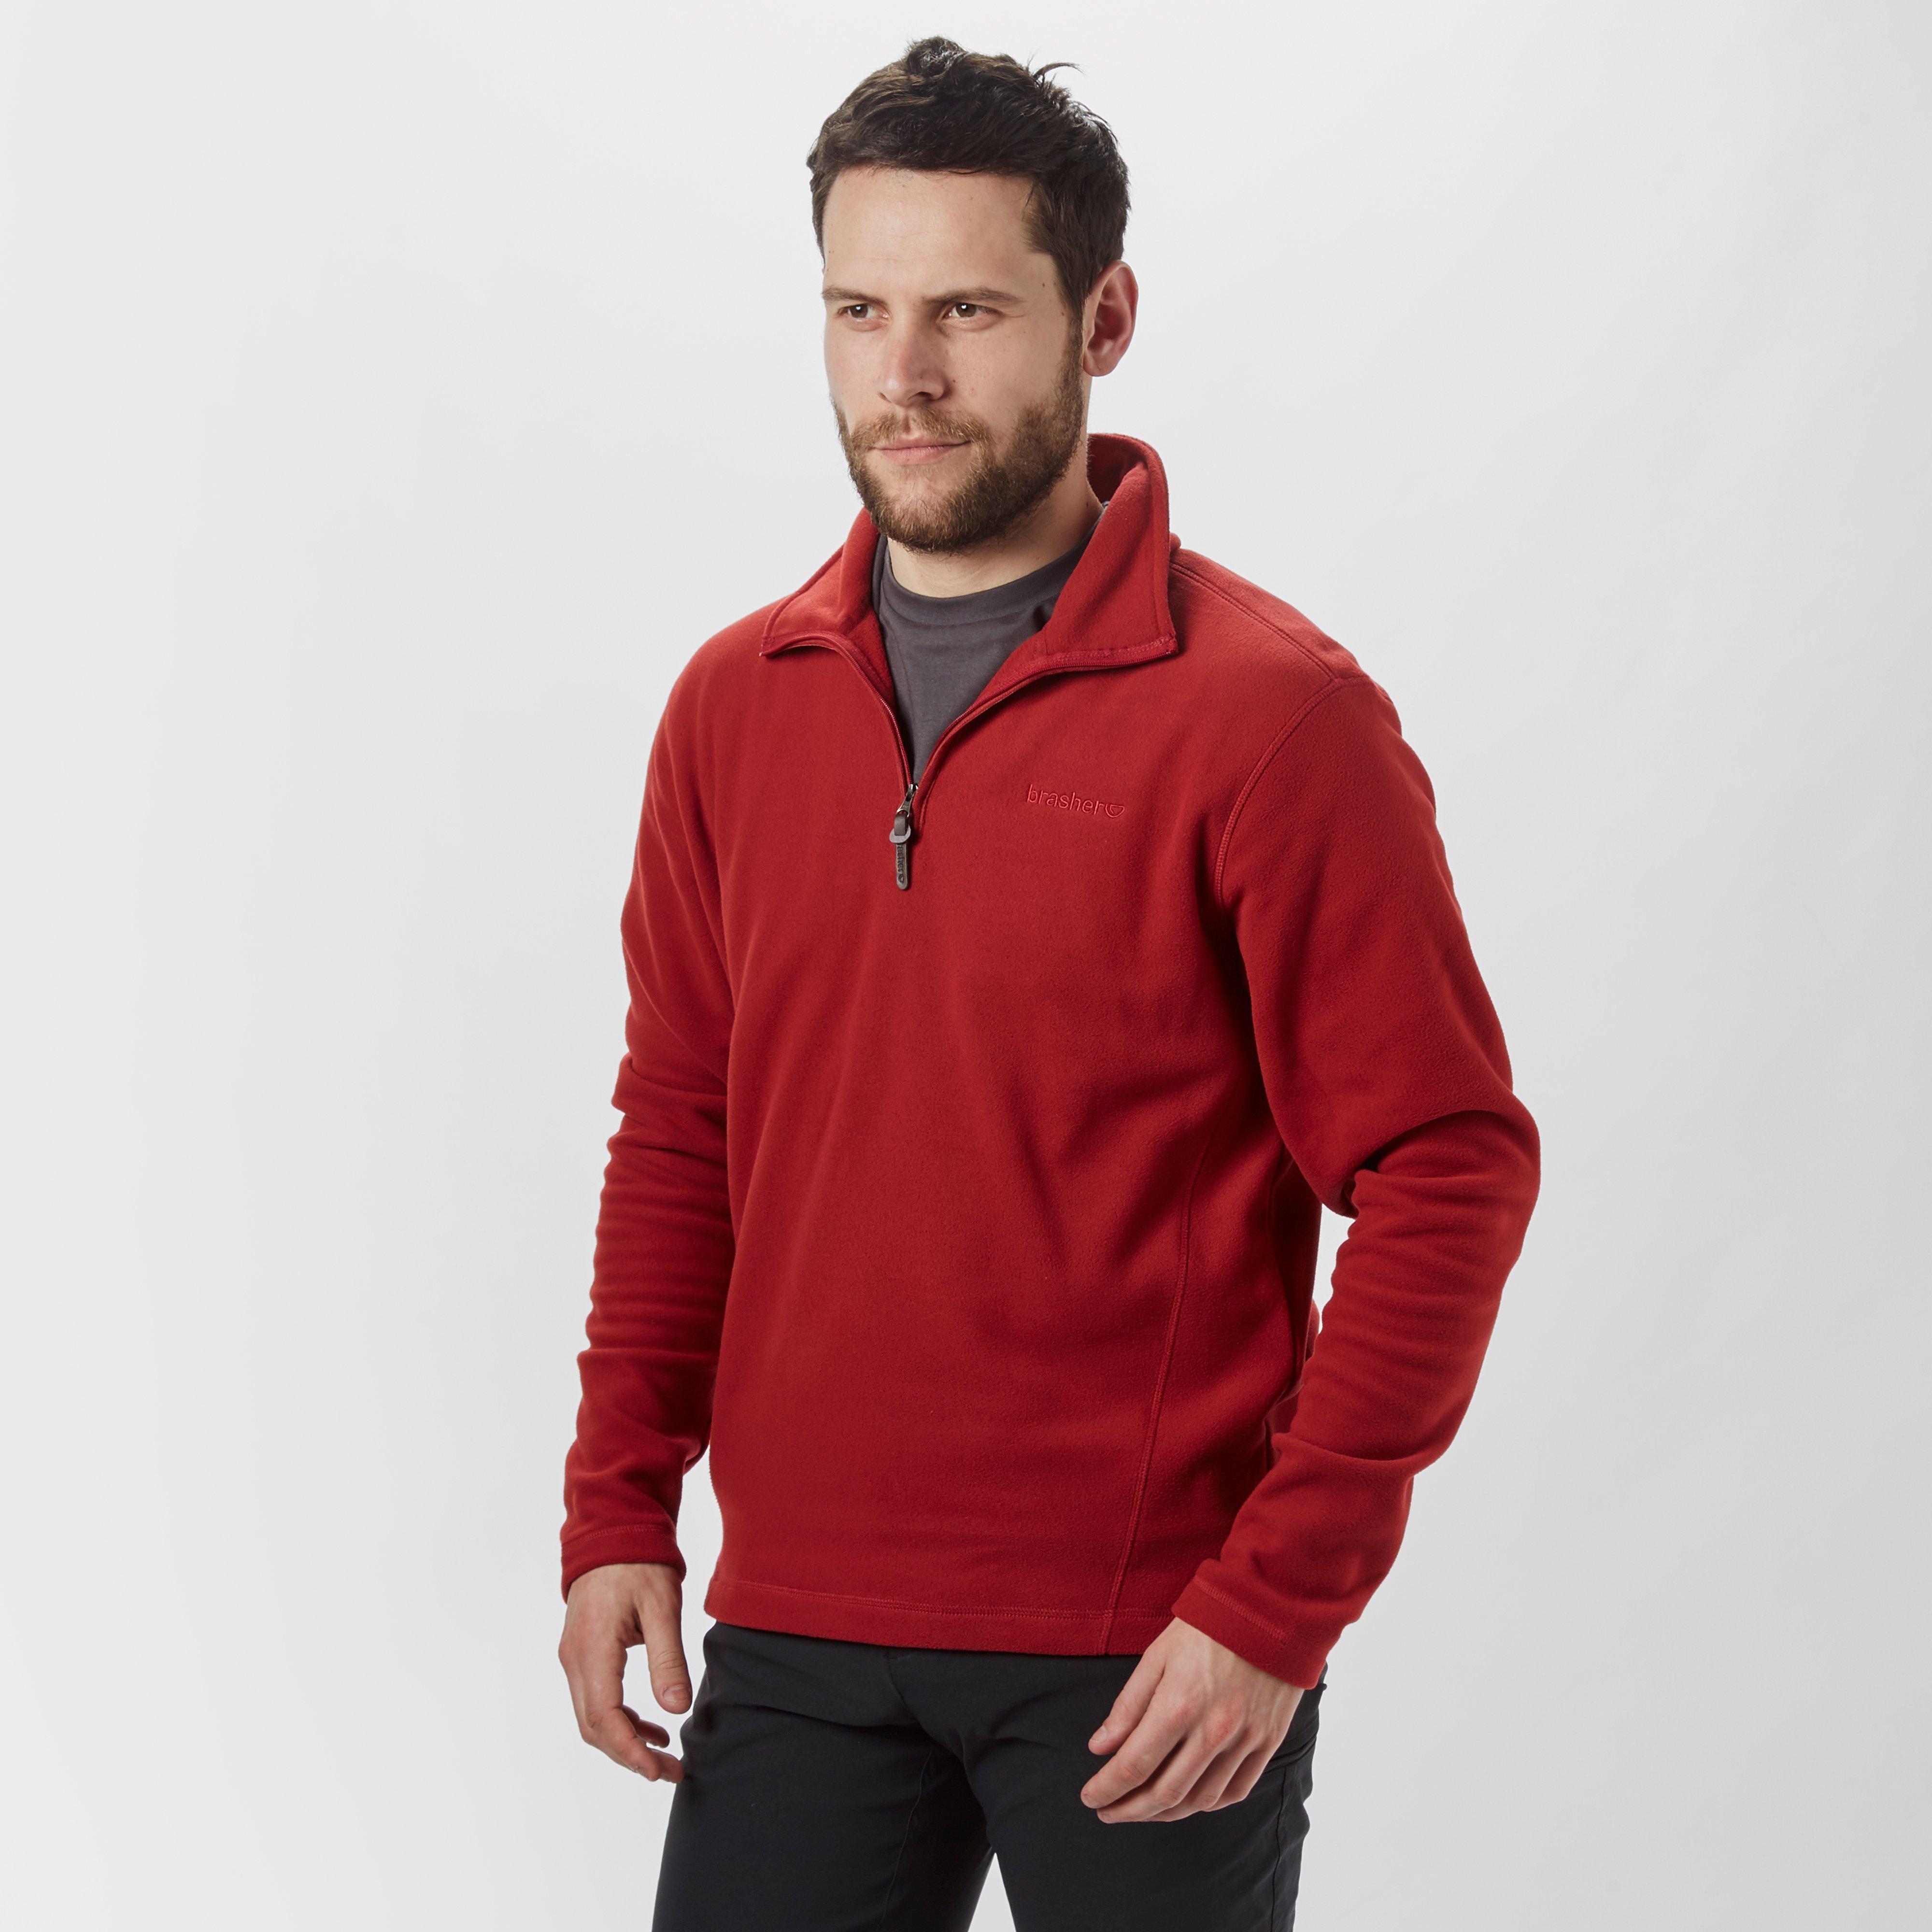 Brasher Mens Bleaberry Half Zip Fleece - Red/brd  Red/brd